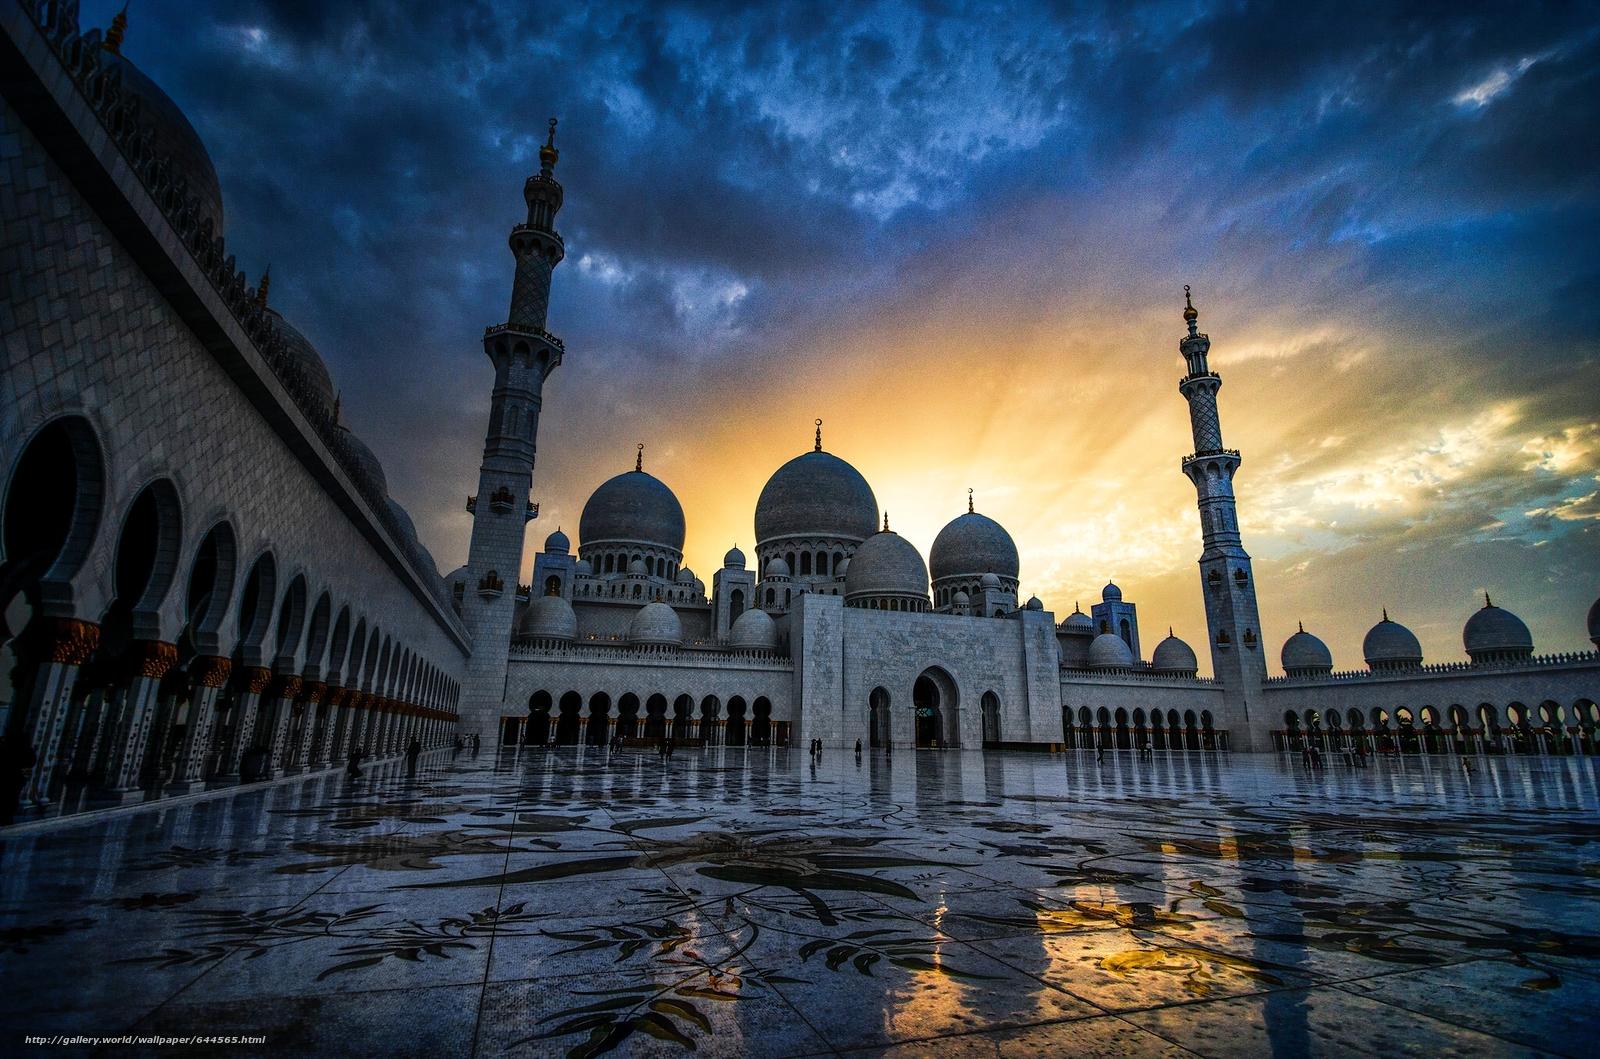 Tlcharger Fond d'ecran Grande Mosquée Sheikh Zayed,  Abu Dhabi,  Émirats arabes unis,  Mosquée Sheikh Zayed Fonds d'ecran gratuits pour votre rsolution du bureau 2048x1356 — image №644565